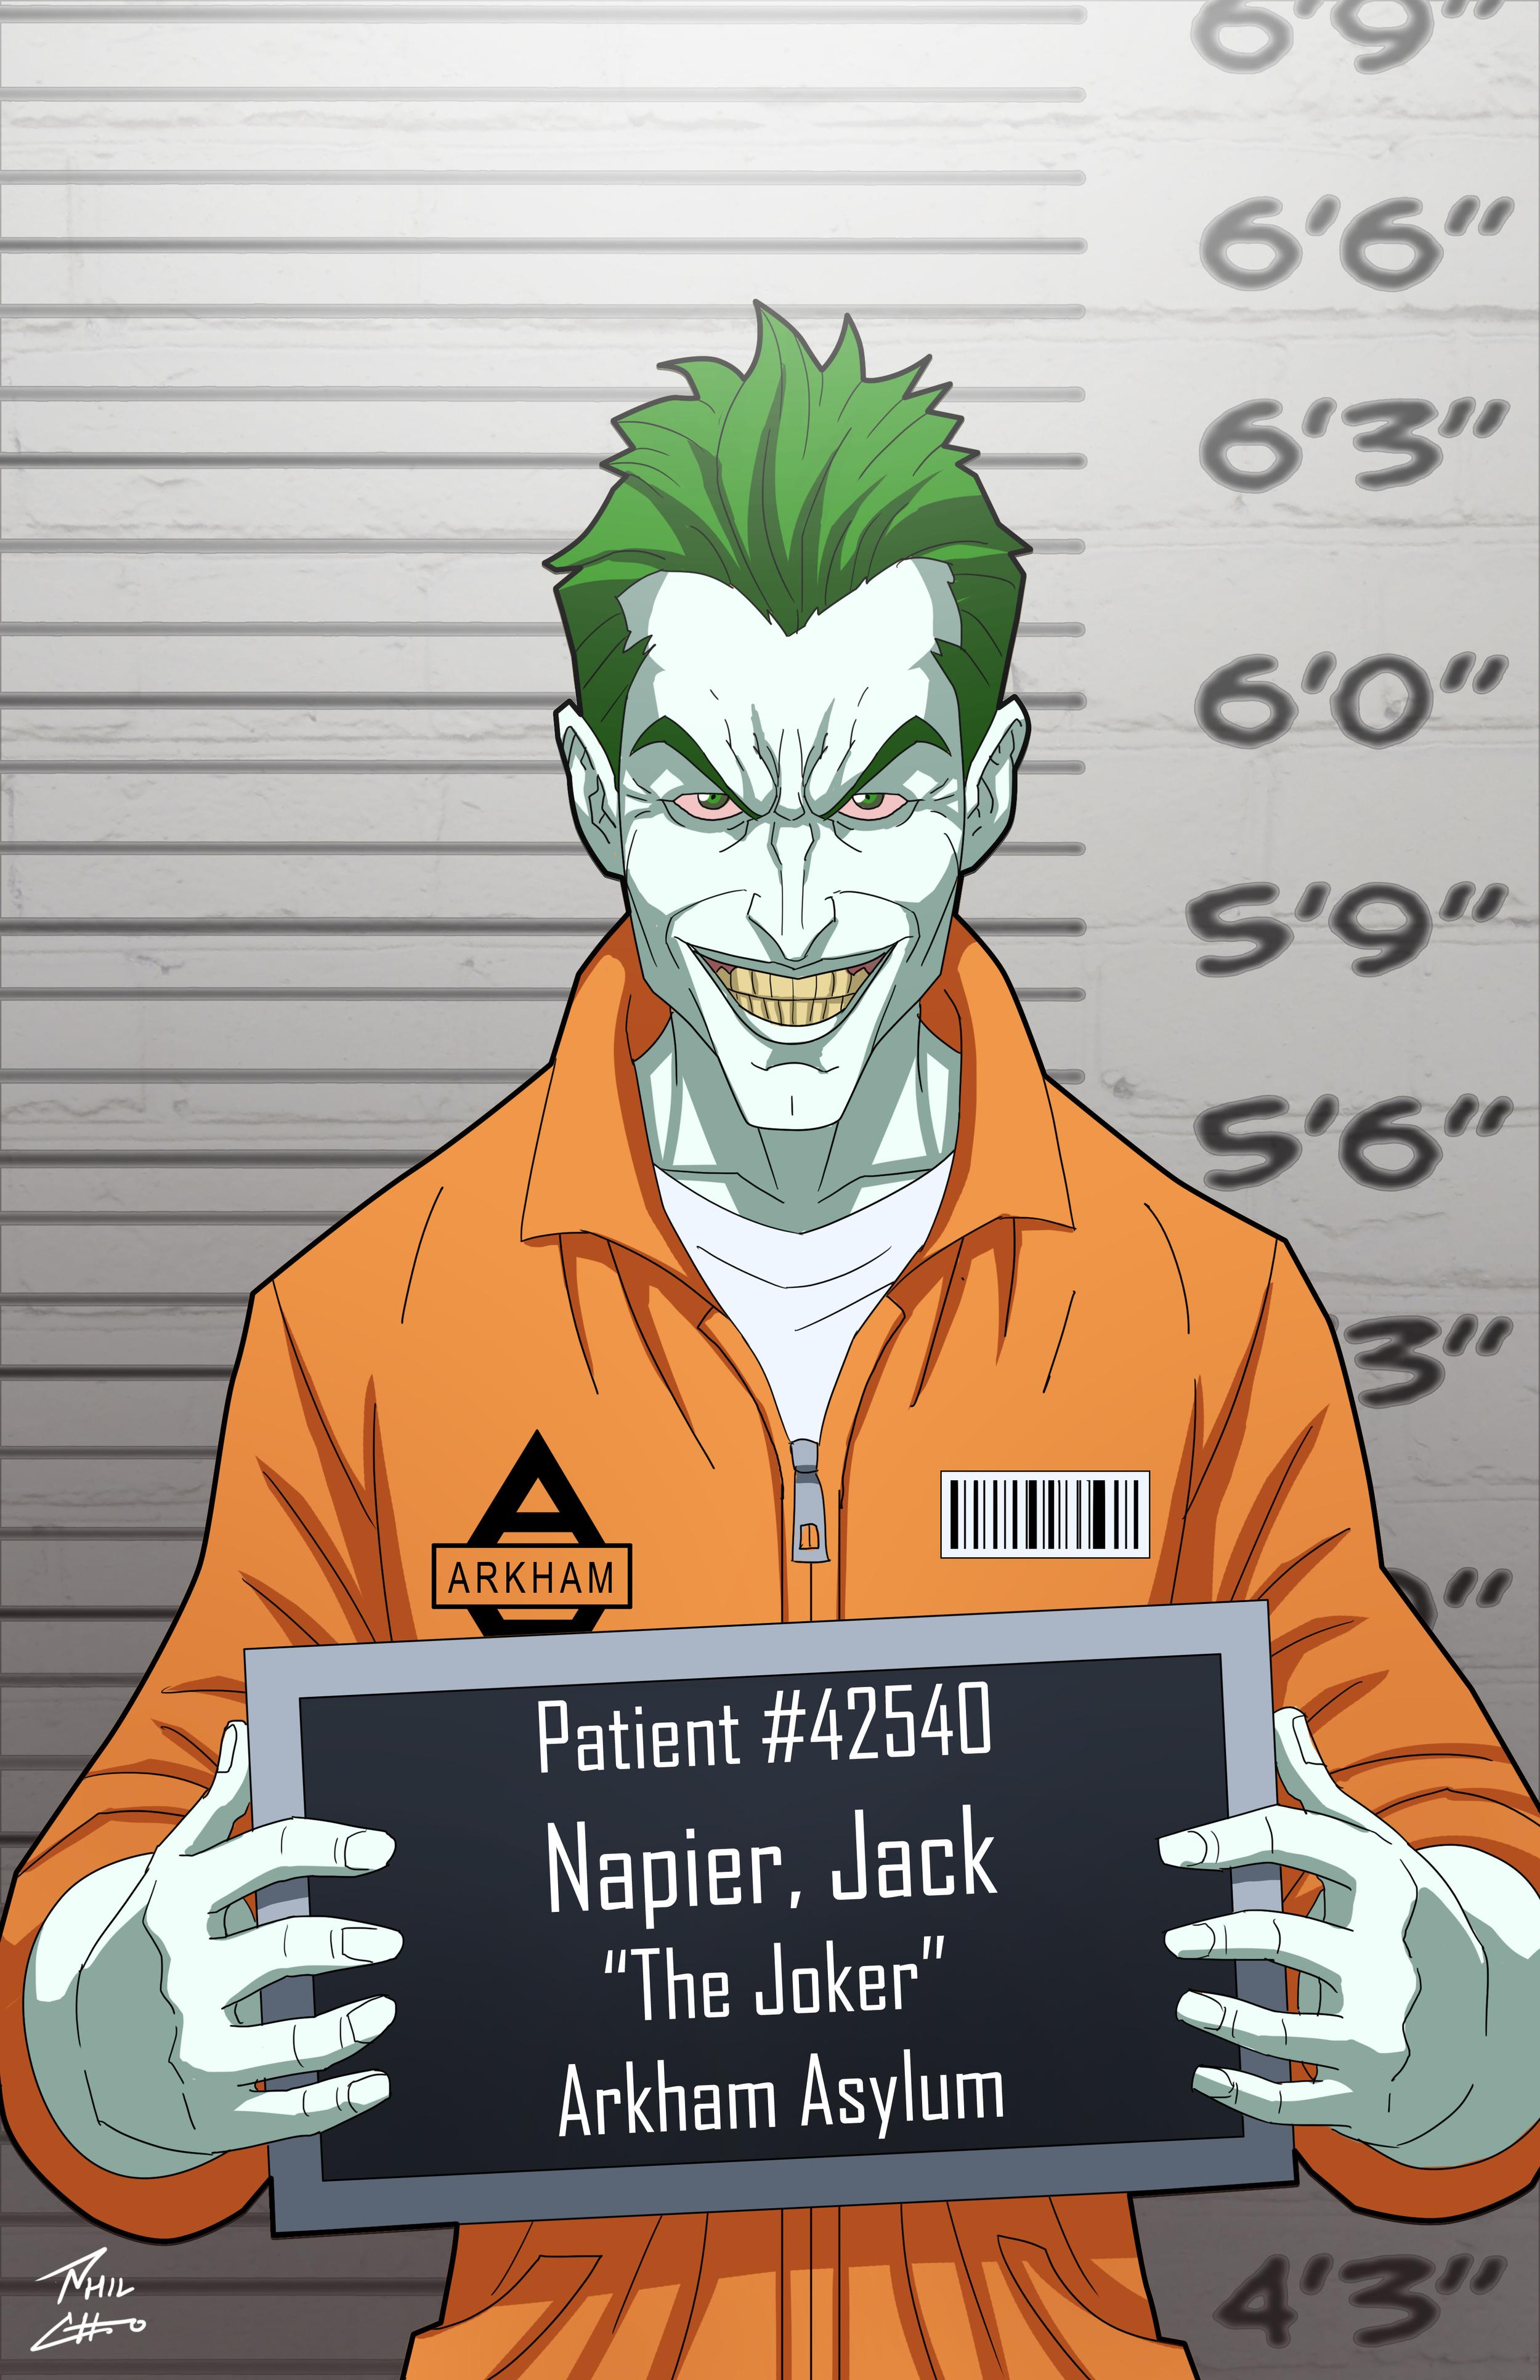 Jack, Napier